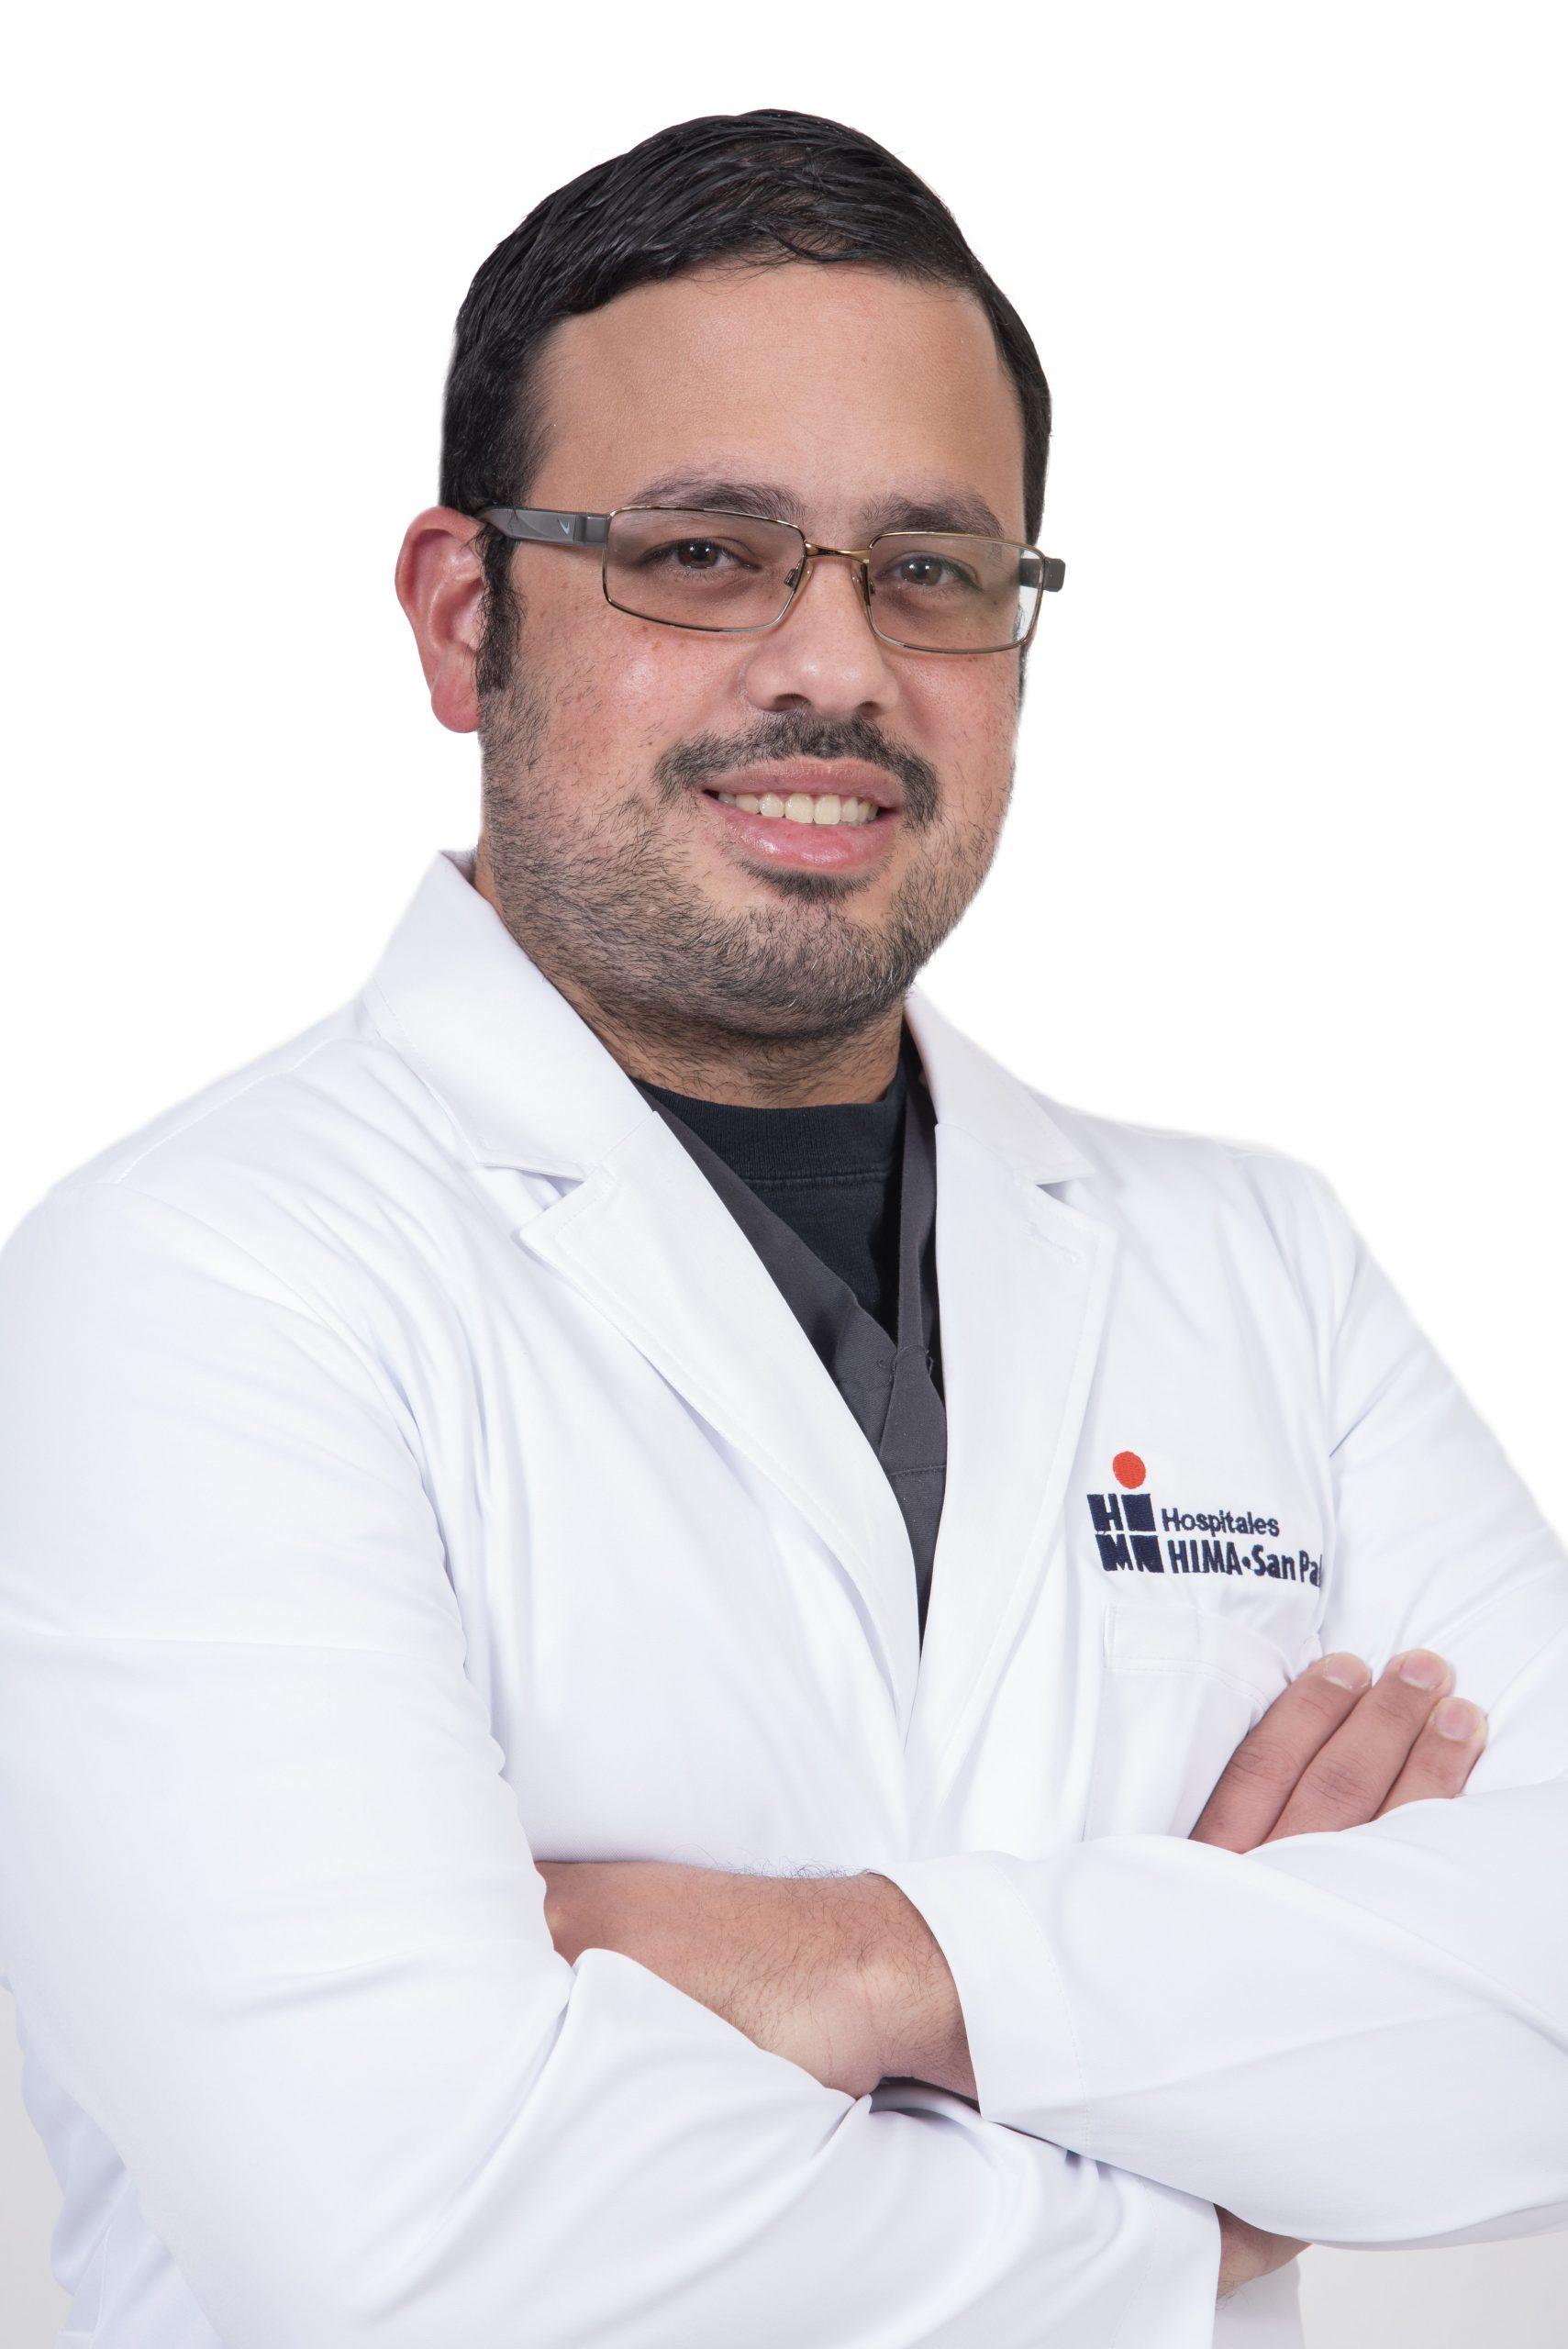 Alex-Morales-Perez-MD